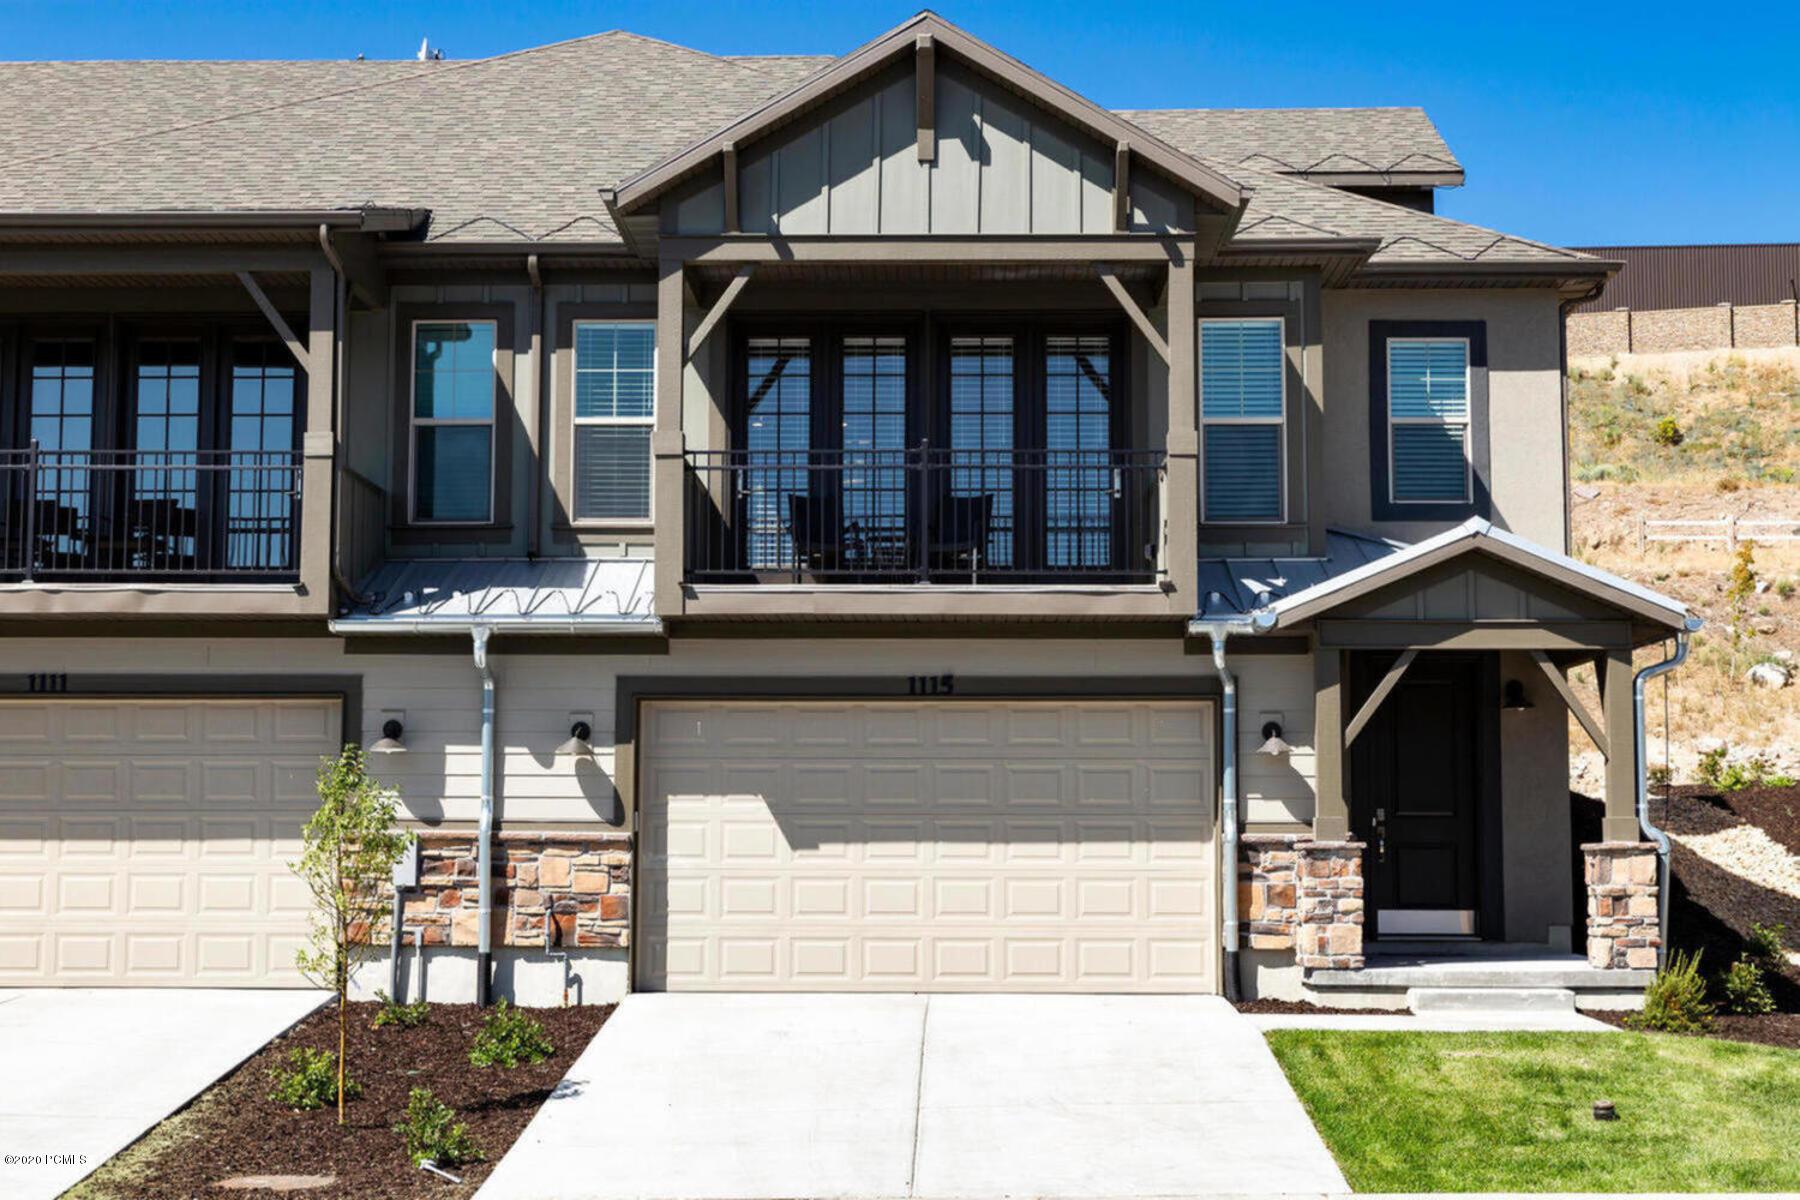 1047 Wasatch Springs Rd #P3, Heber City, Utah 84032, 4 Bedrooms Bedrooms, ,4 BathroomsBathrooms,Condominium,For Sale,Wasatch Springs Rd #P3,12003908